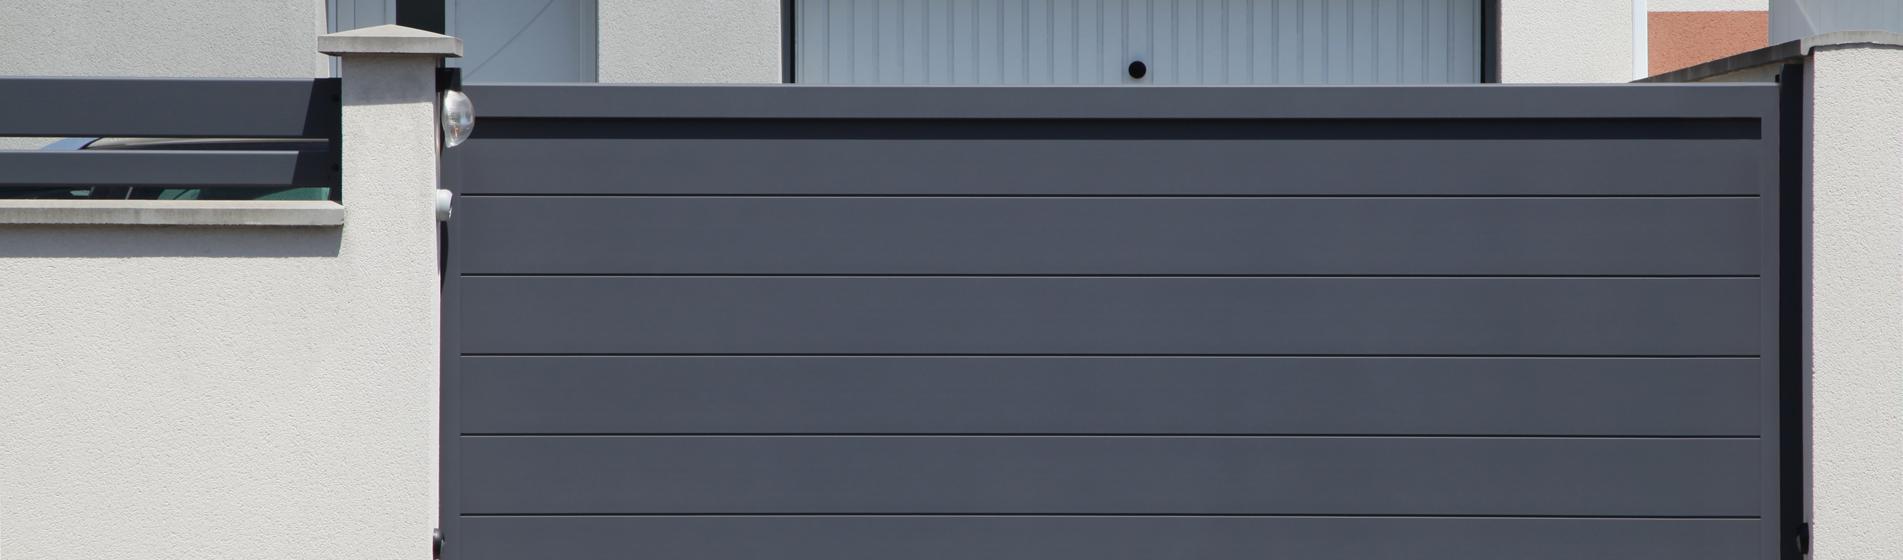 acquérir portail coulissant 30 Gard